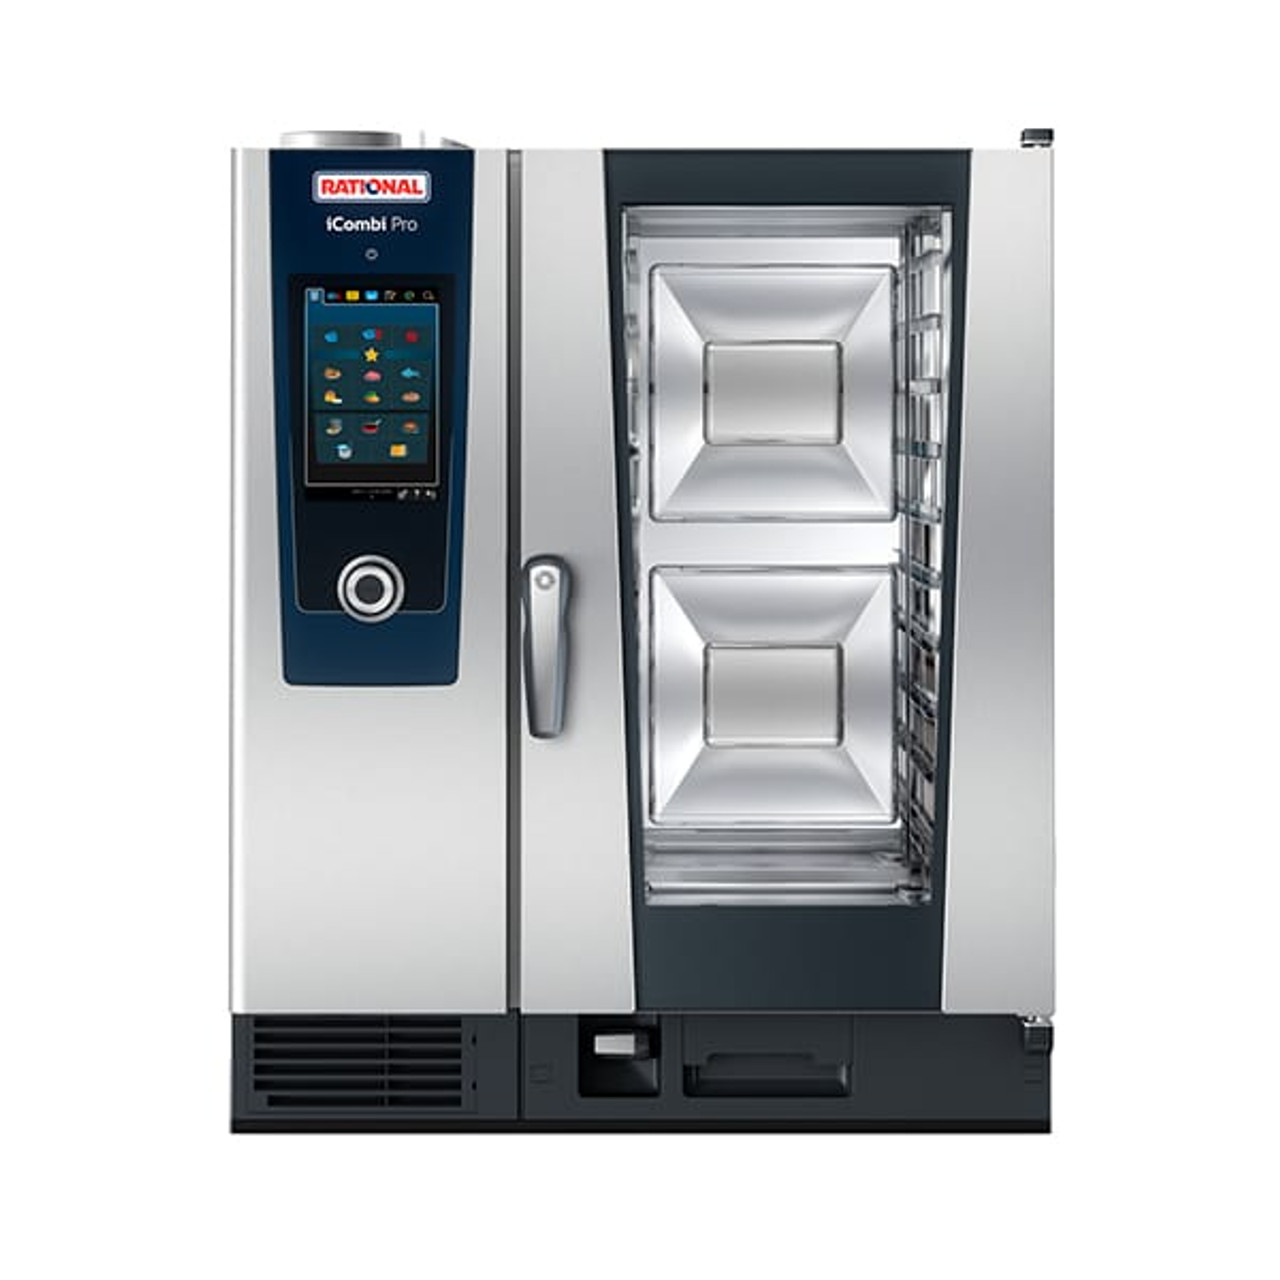 Rational ICP101 combi oven